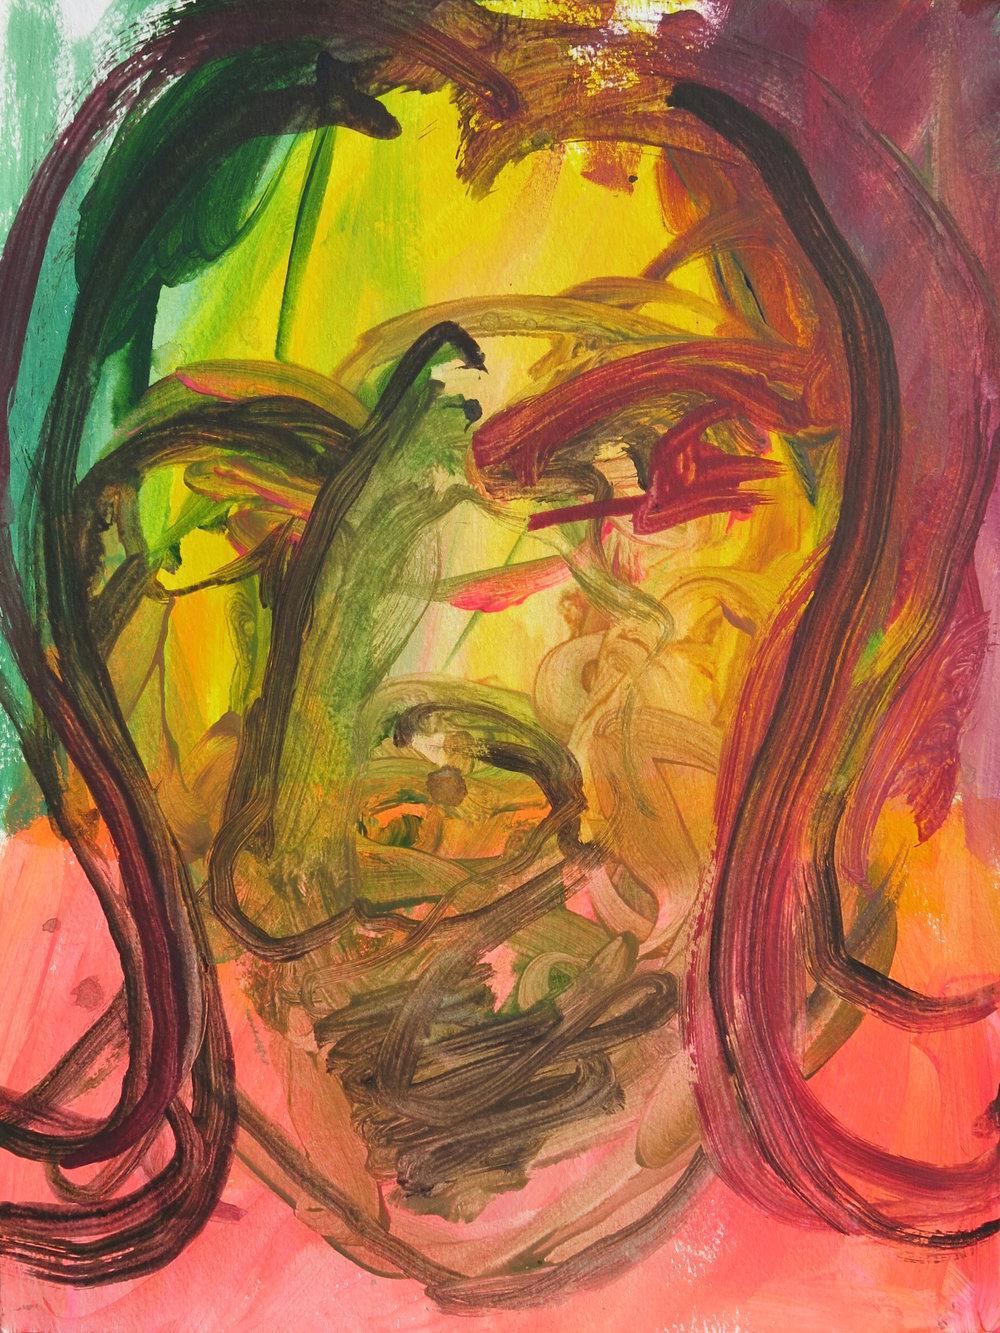 Barbra Streisand Portrait #13